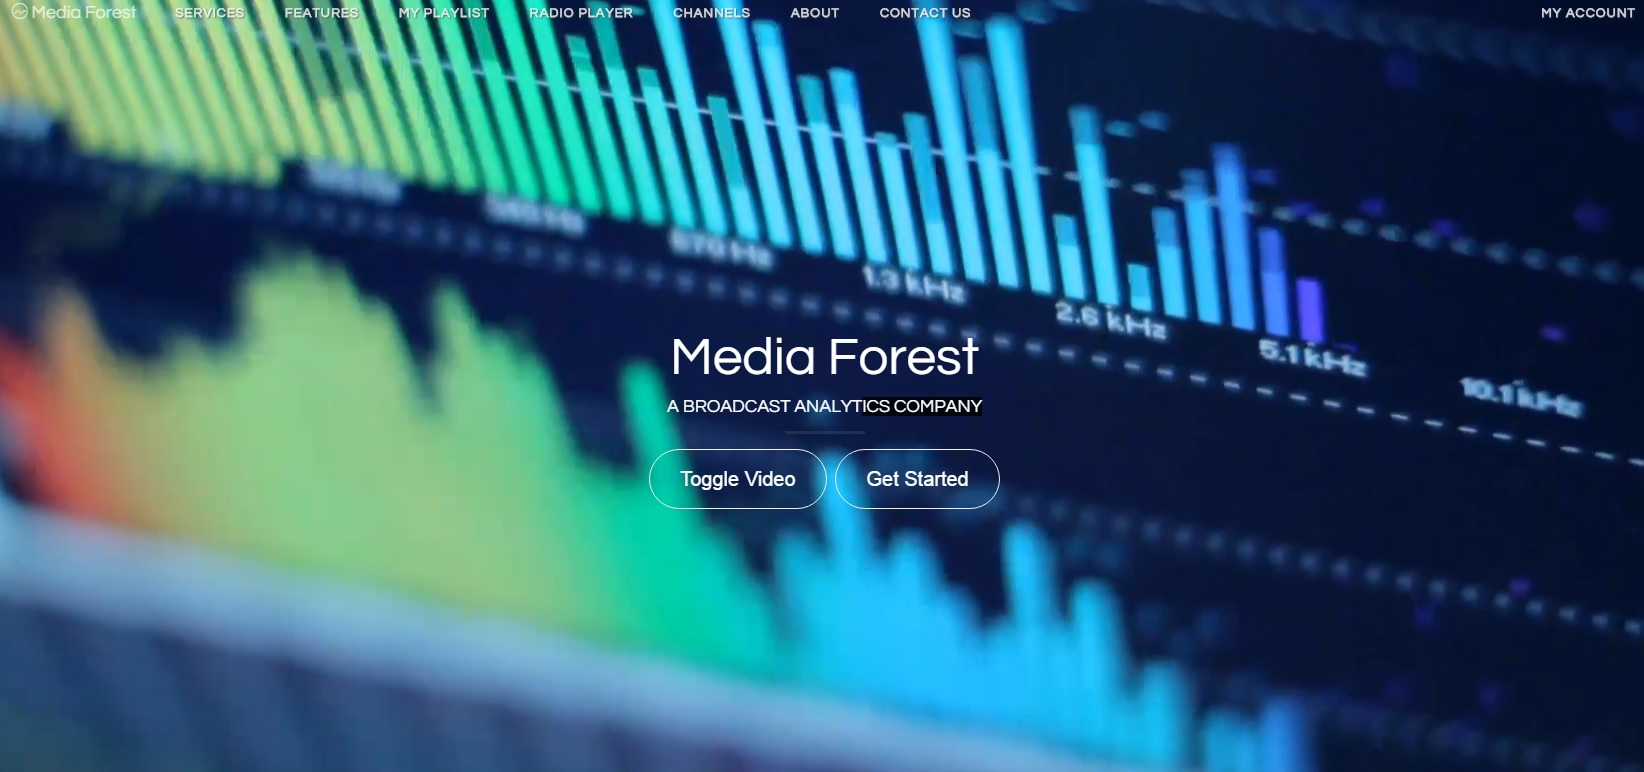 MF_broadcast_analytics.jpg